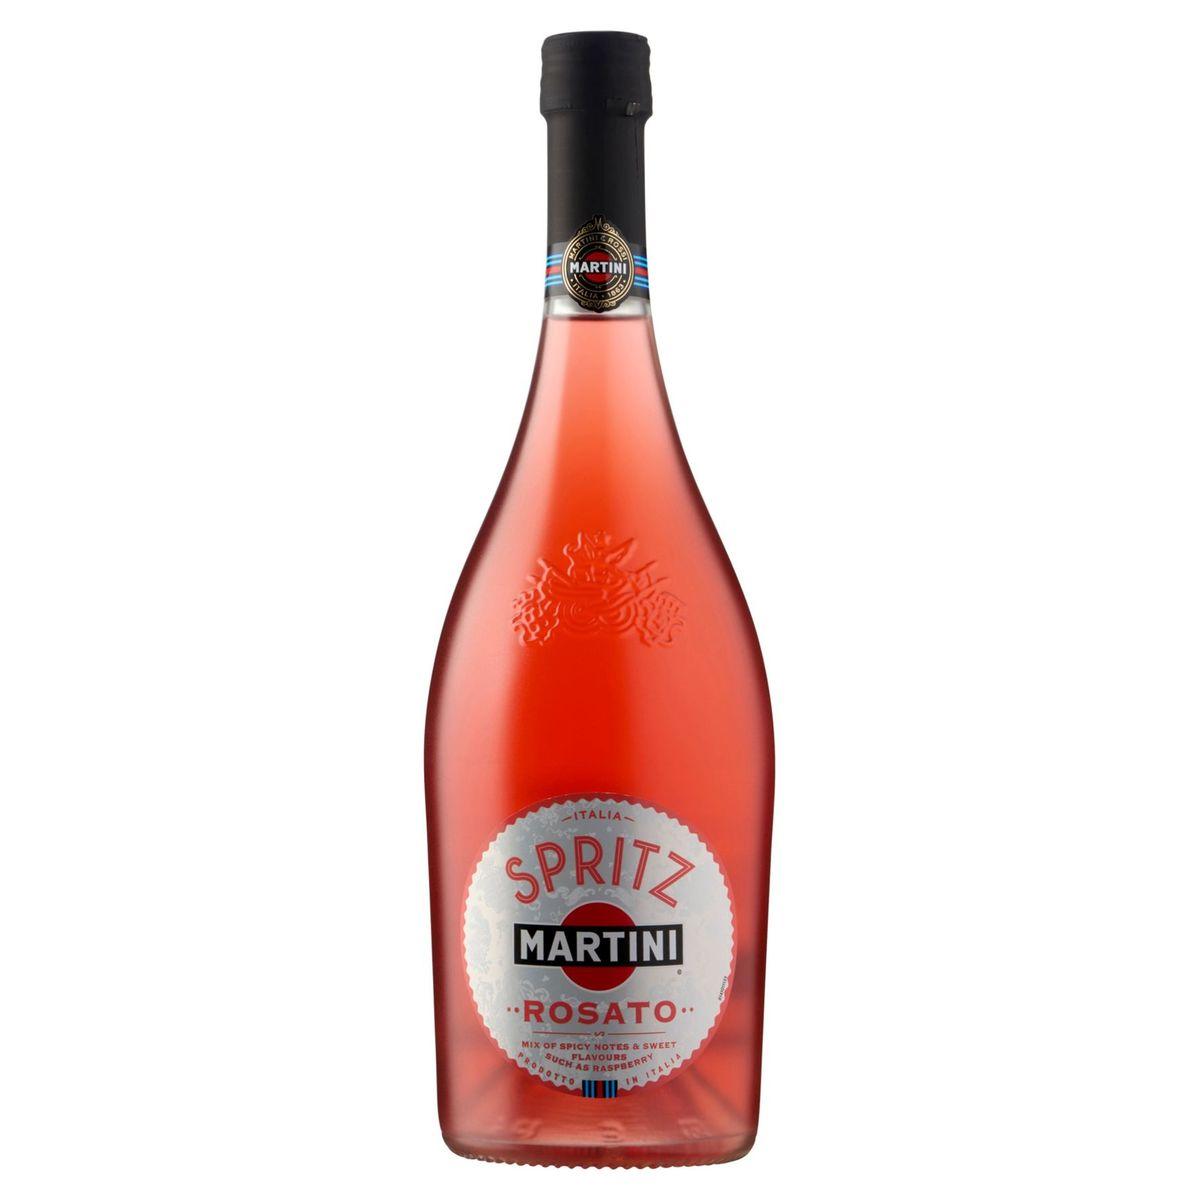 Martini Spritz Rosato 750 ml